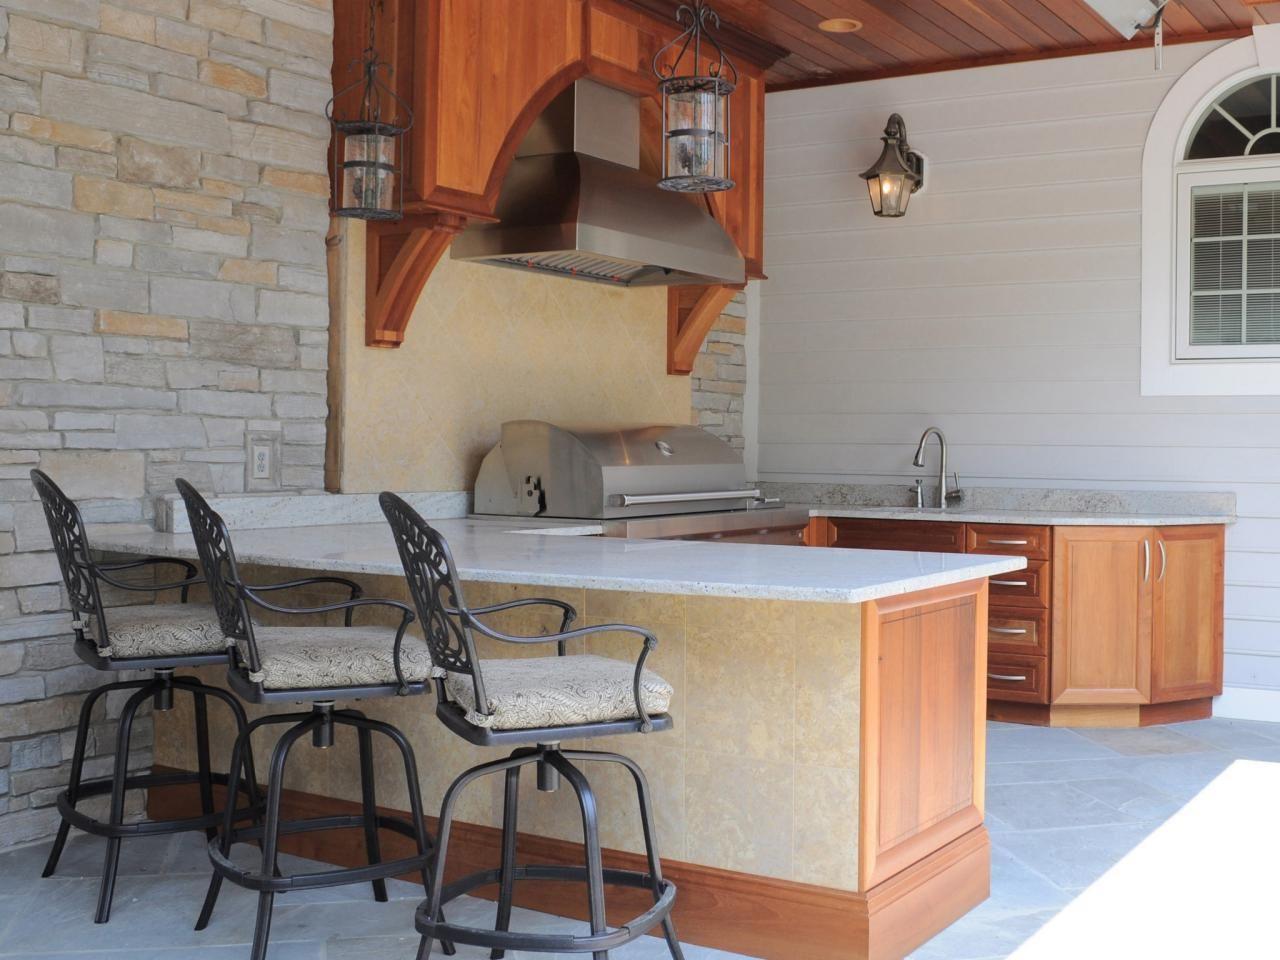 Cheap Outdoor Kitchen Ideas Gosiadesign Within Outdoor Kitchen Alluring Small Outdoor Kitchen Designs Decorating Design